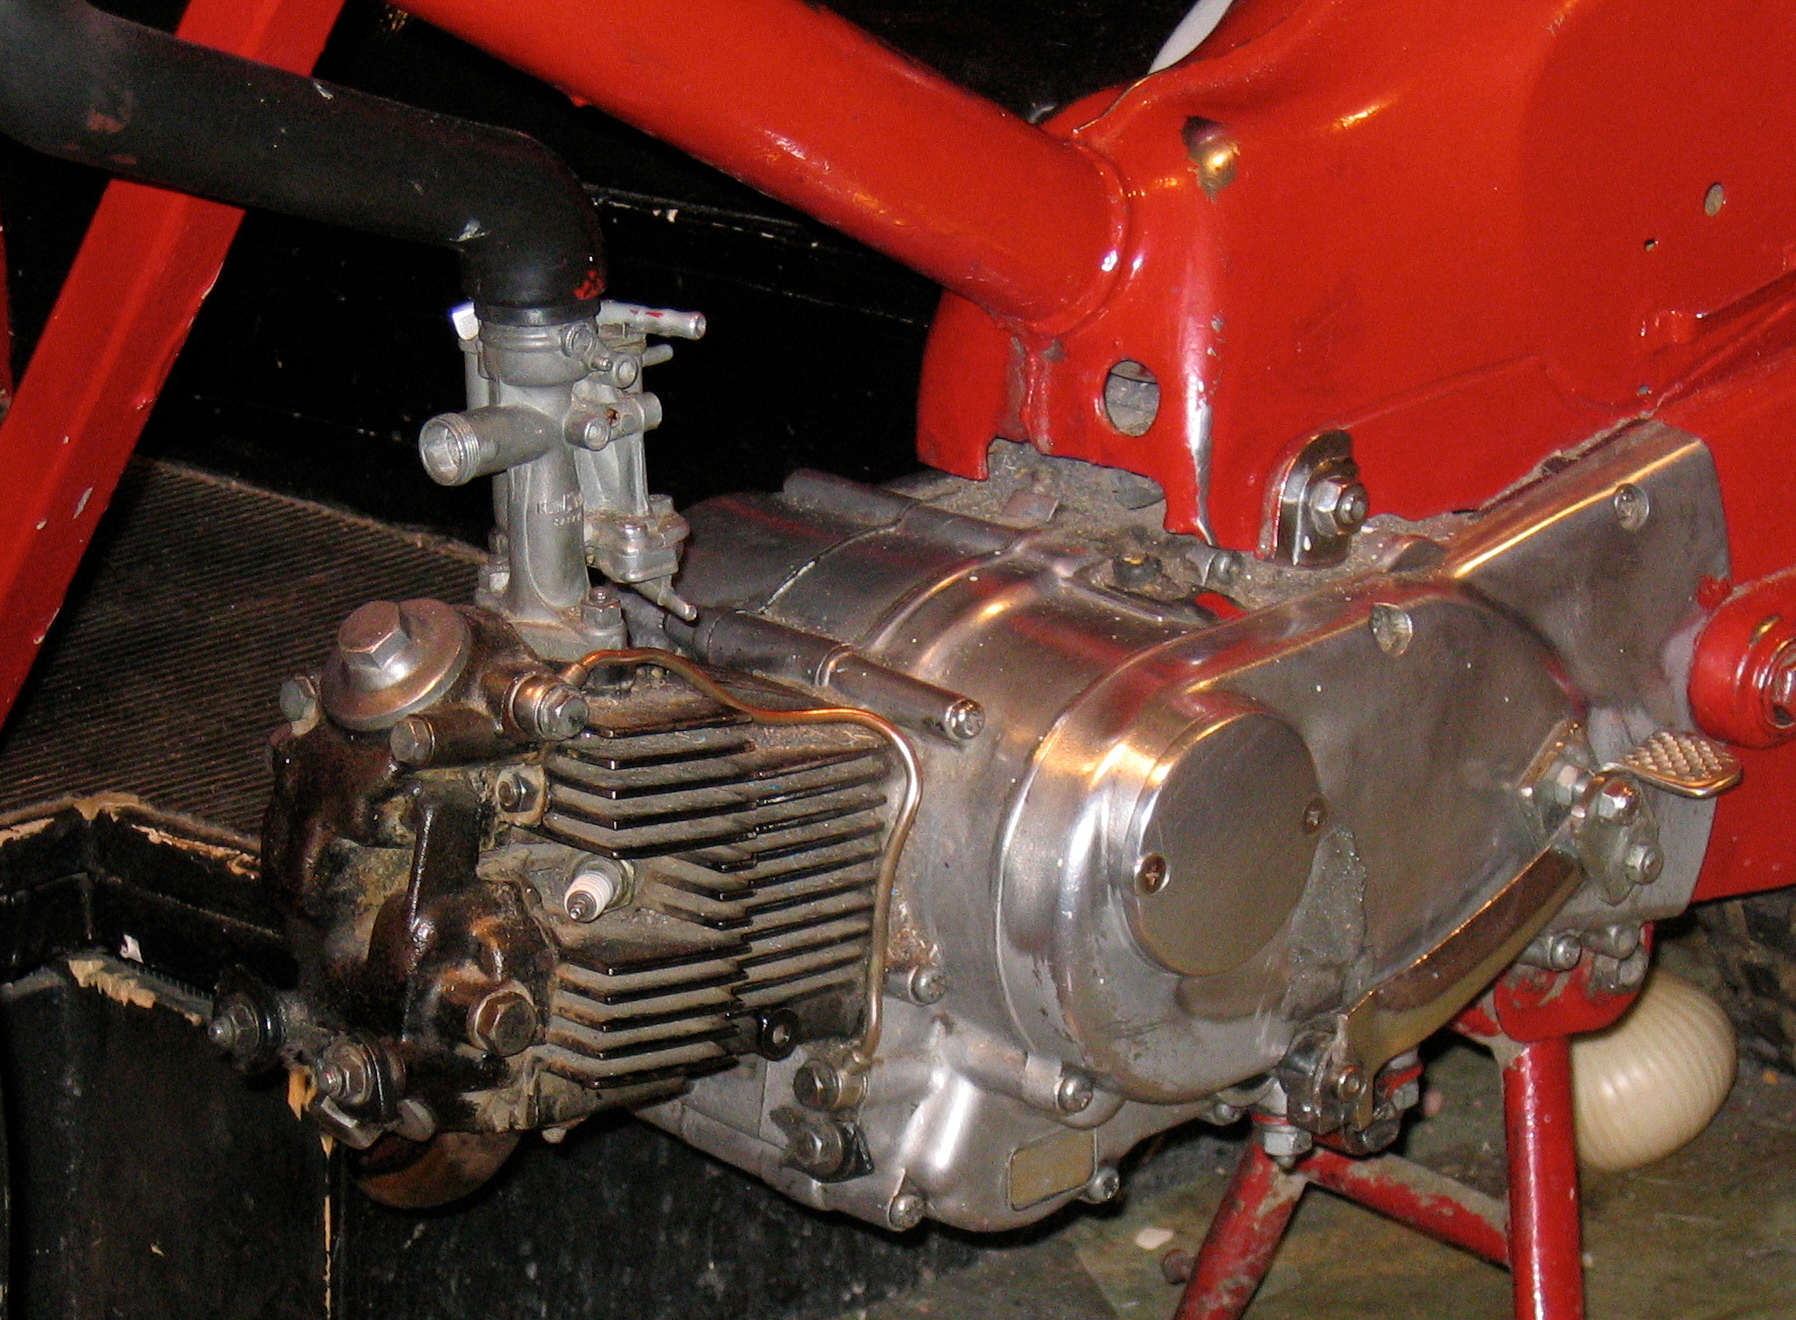 50cc Dirt Bike Engine Diagram Enthusiast Wiring Diagrams Honda 90 Motorcycle House Symbols U2022 Rh Maxturner Co Complete Engines 2 Stroke